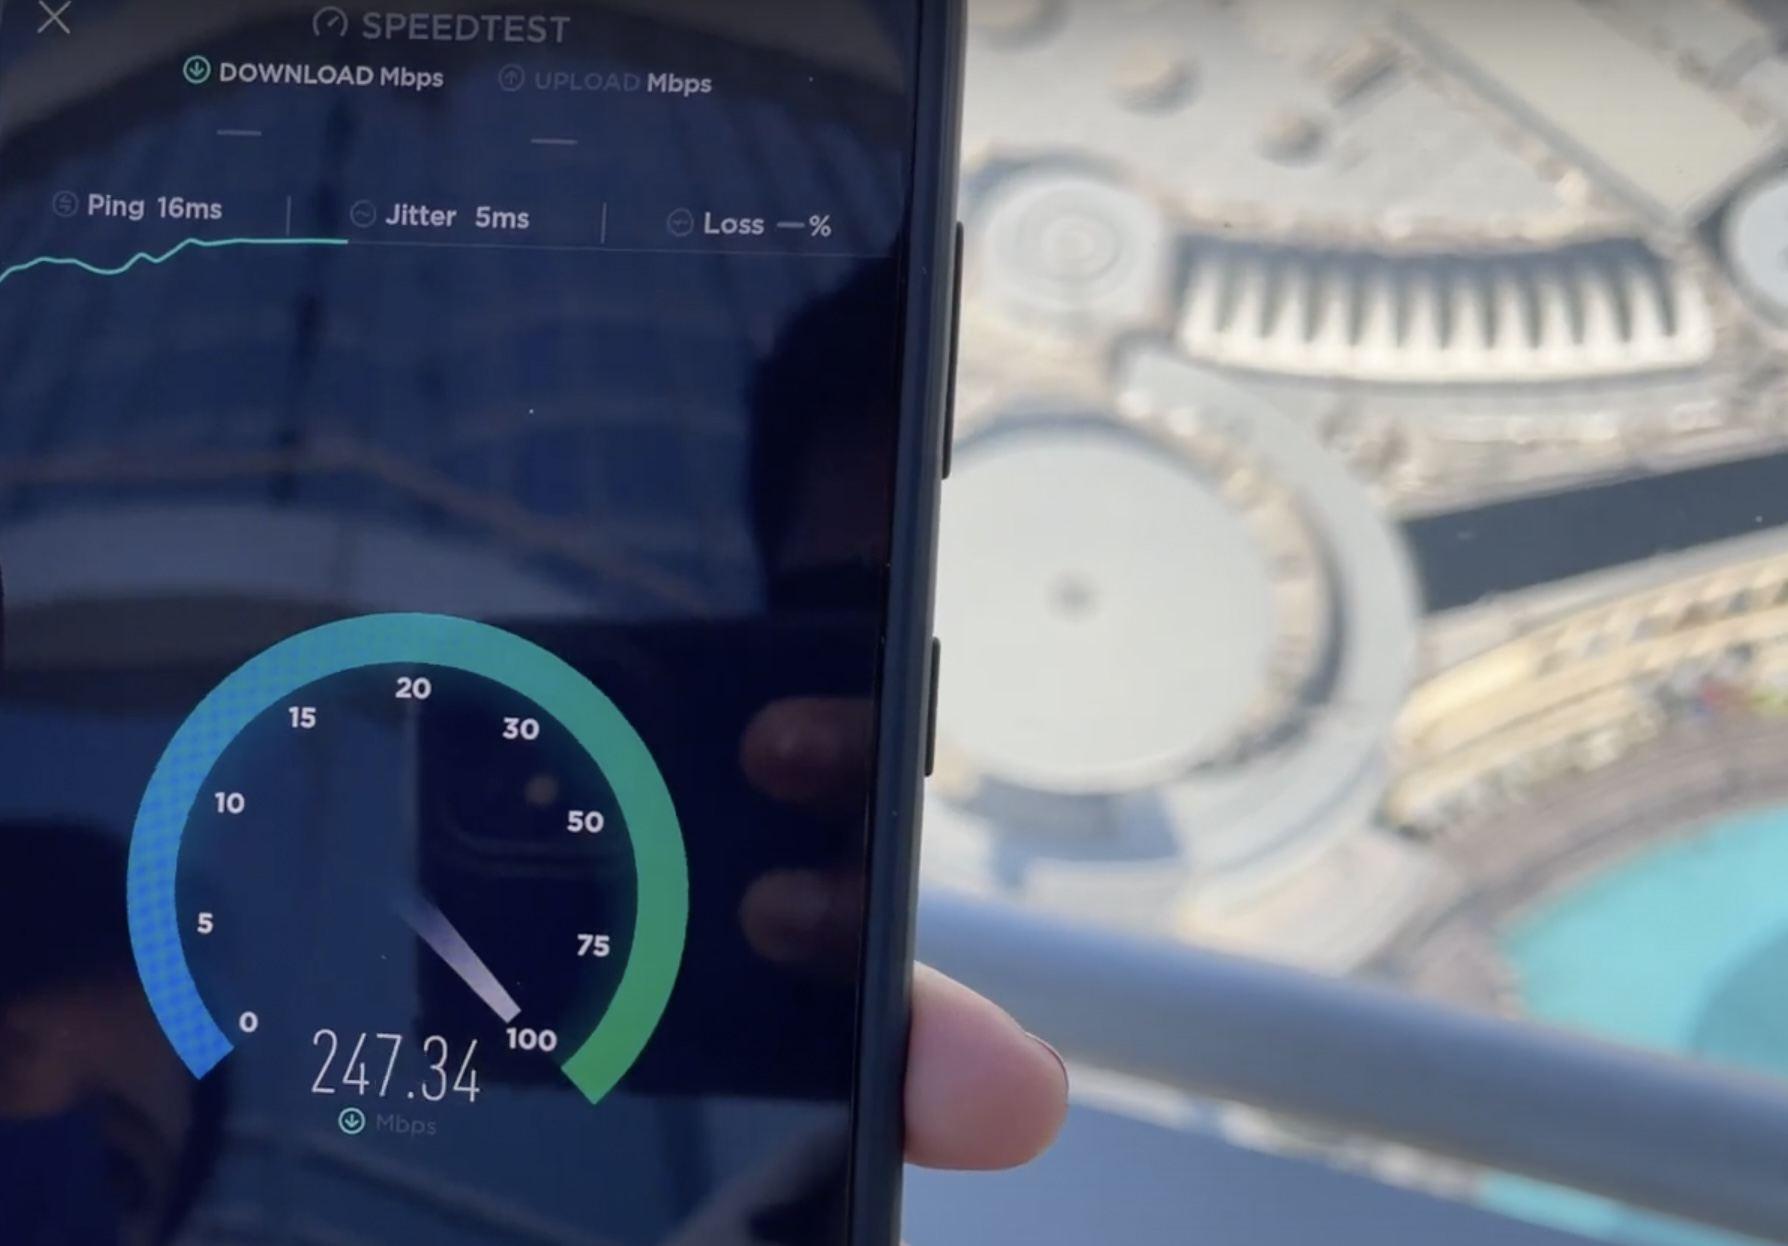 Burj Khalifa Smart Building 5G Indoor System Performance